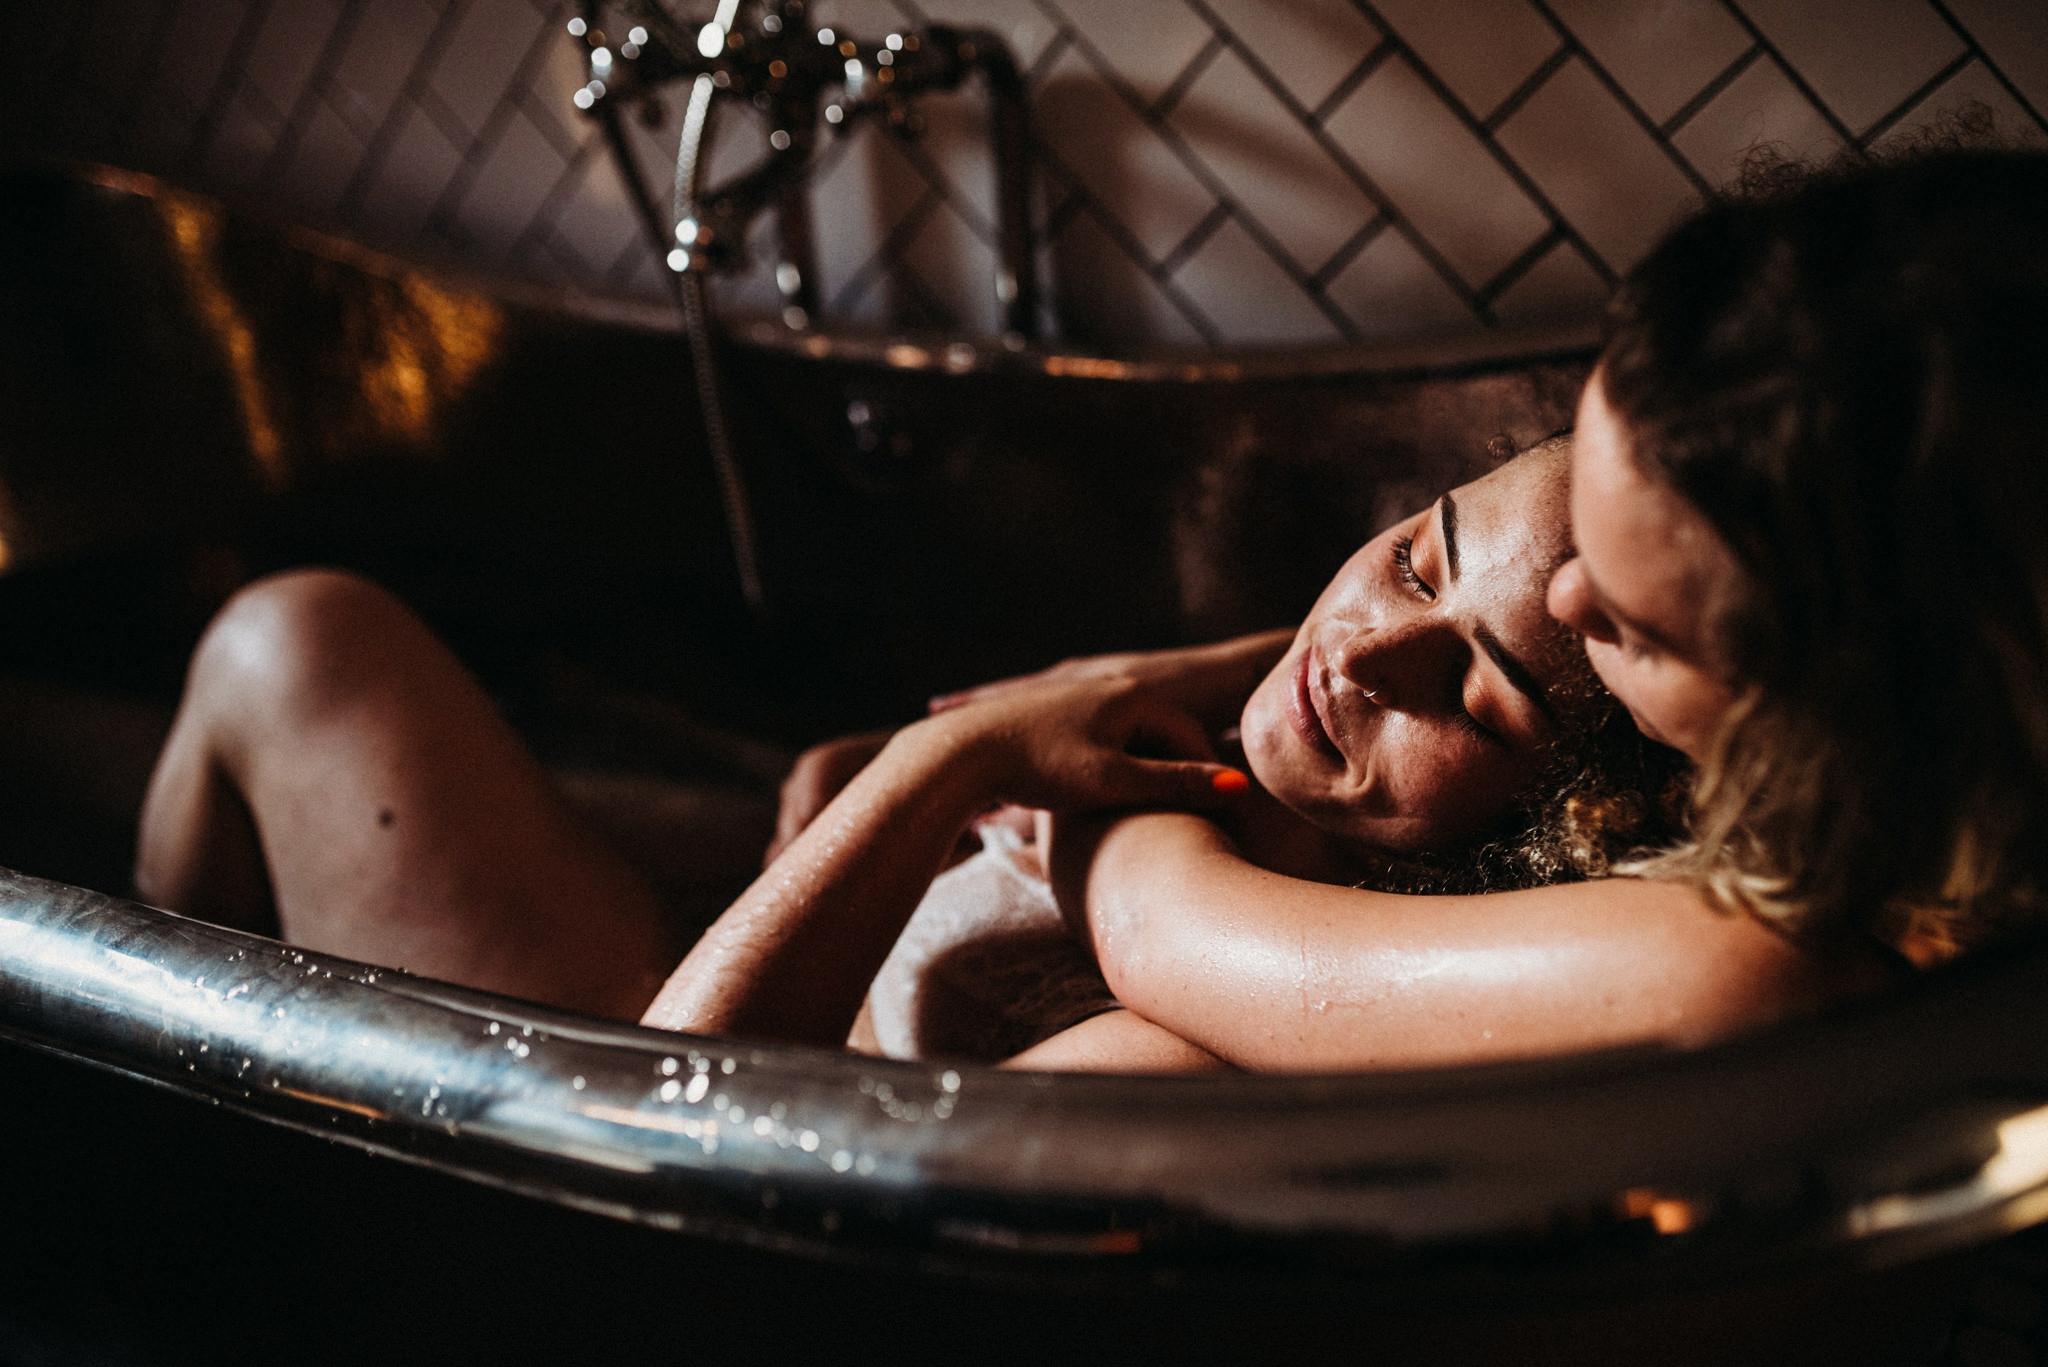 twyla jones photography - treasure coast florida - intimate couples session urban cowboy b&b | brooklyn New York_0042.jpg